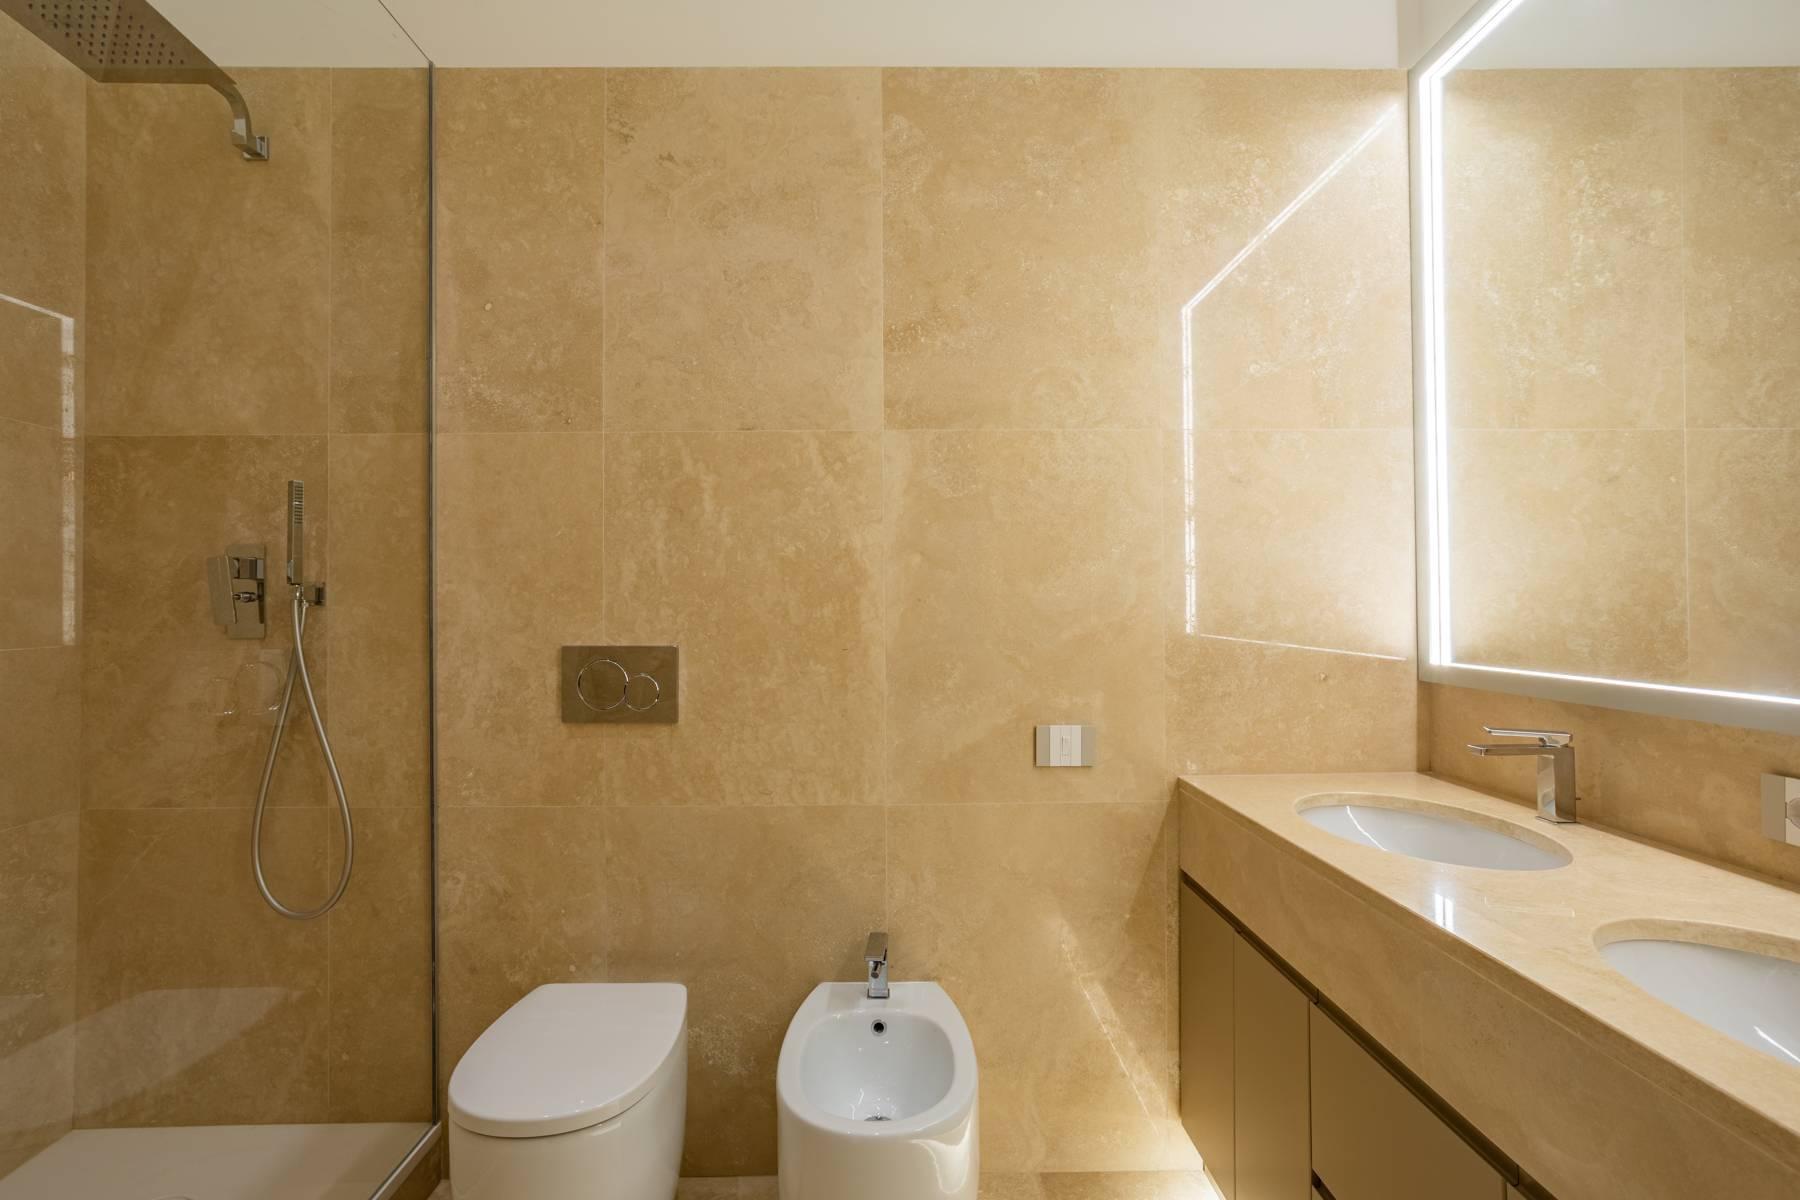 Spanish Steps luxury turnkey apartment - 25